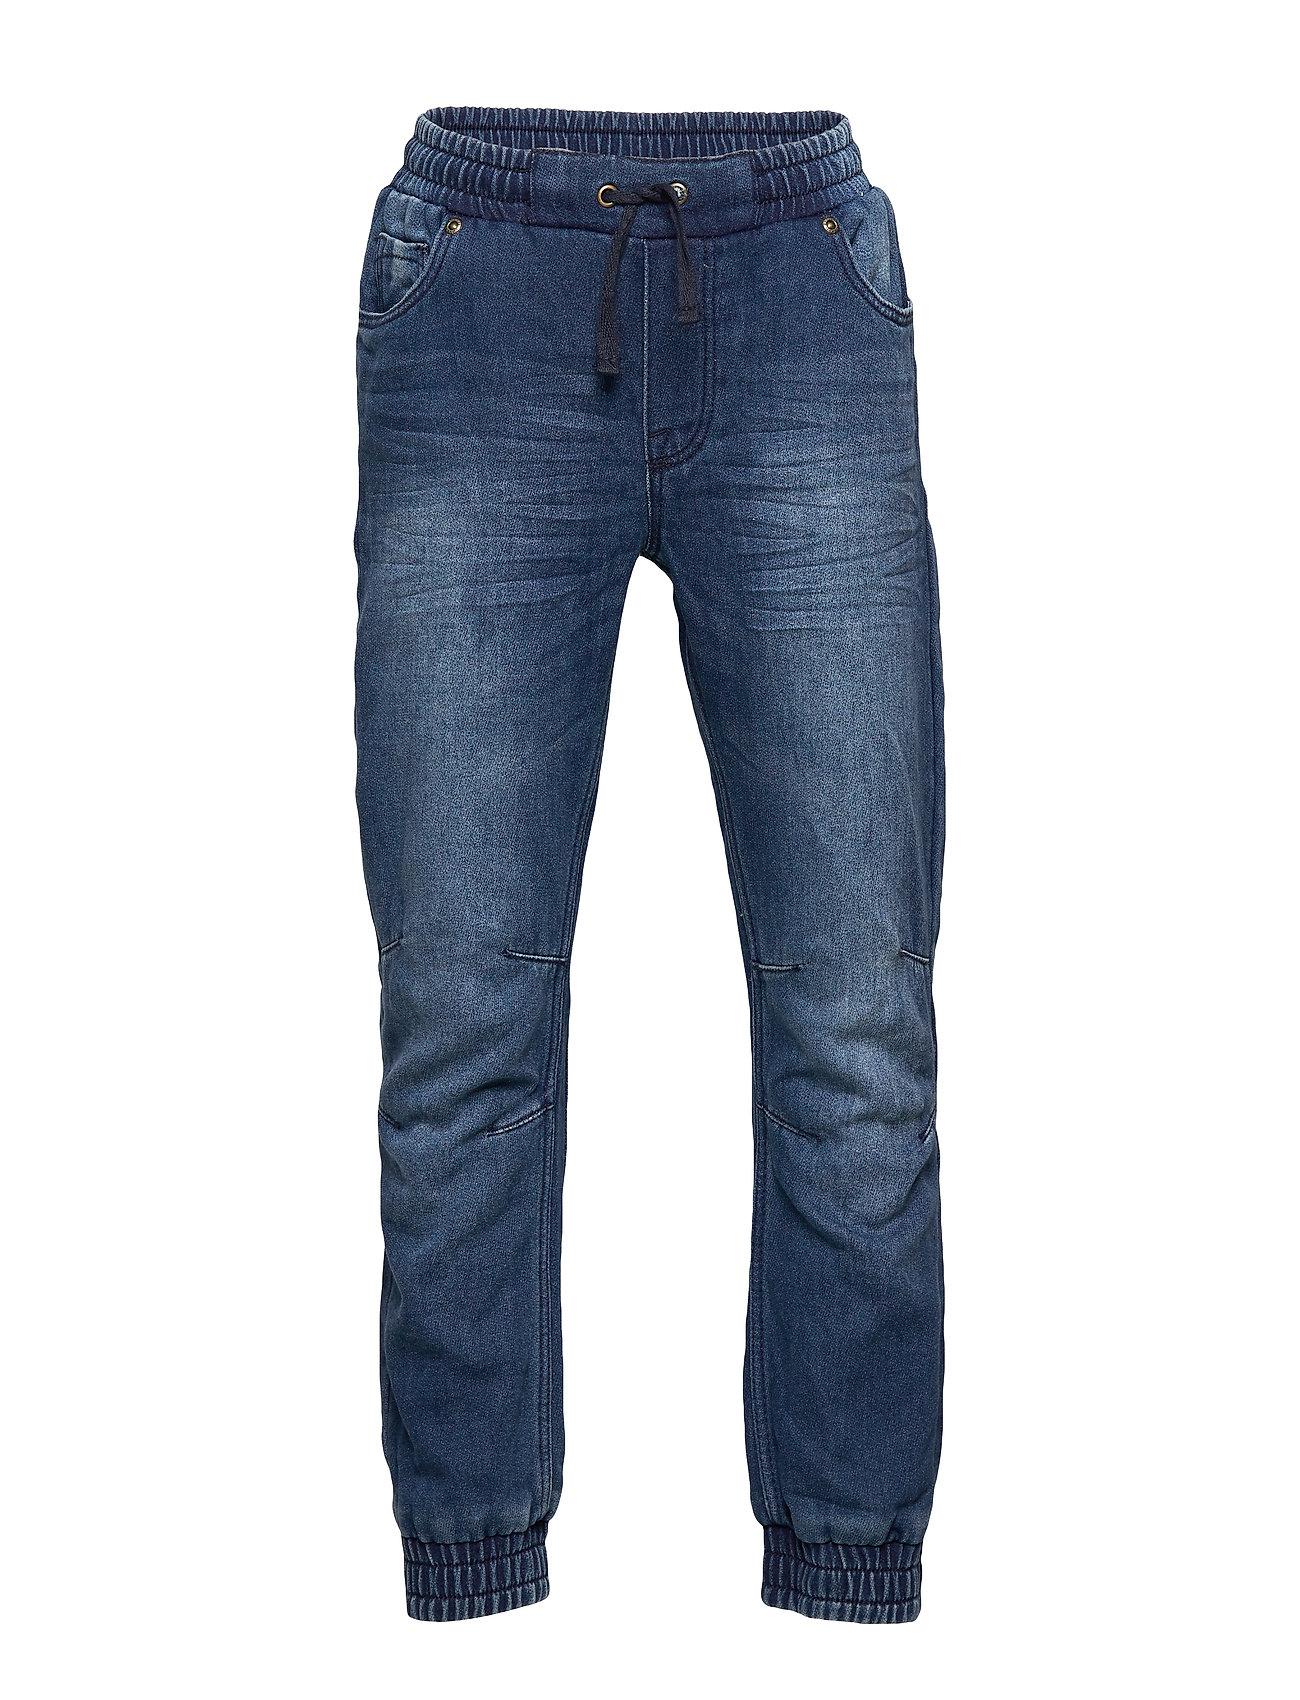 Polarn O. Pyret Jeans Regular School - BLUE DENIM